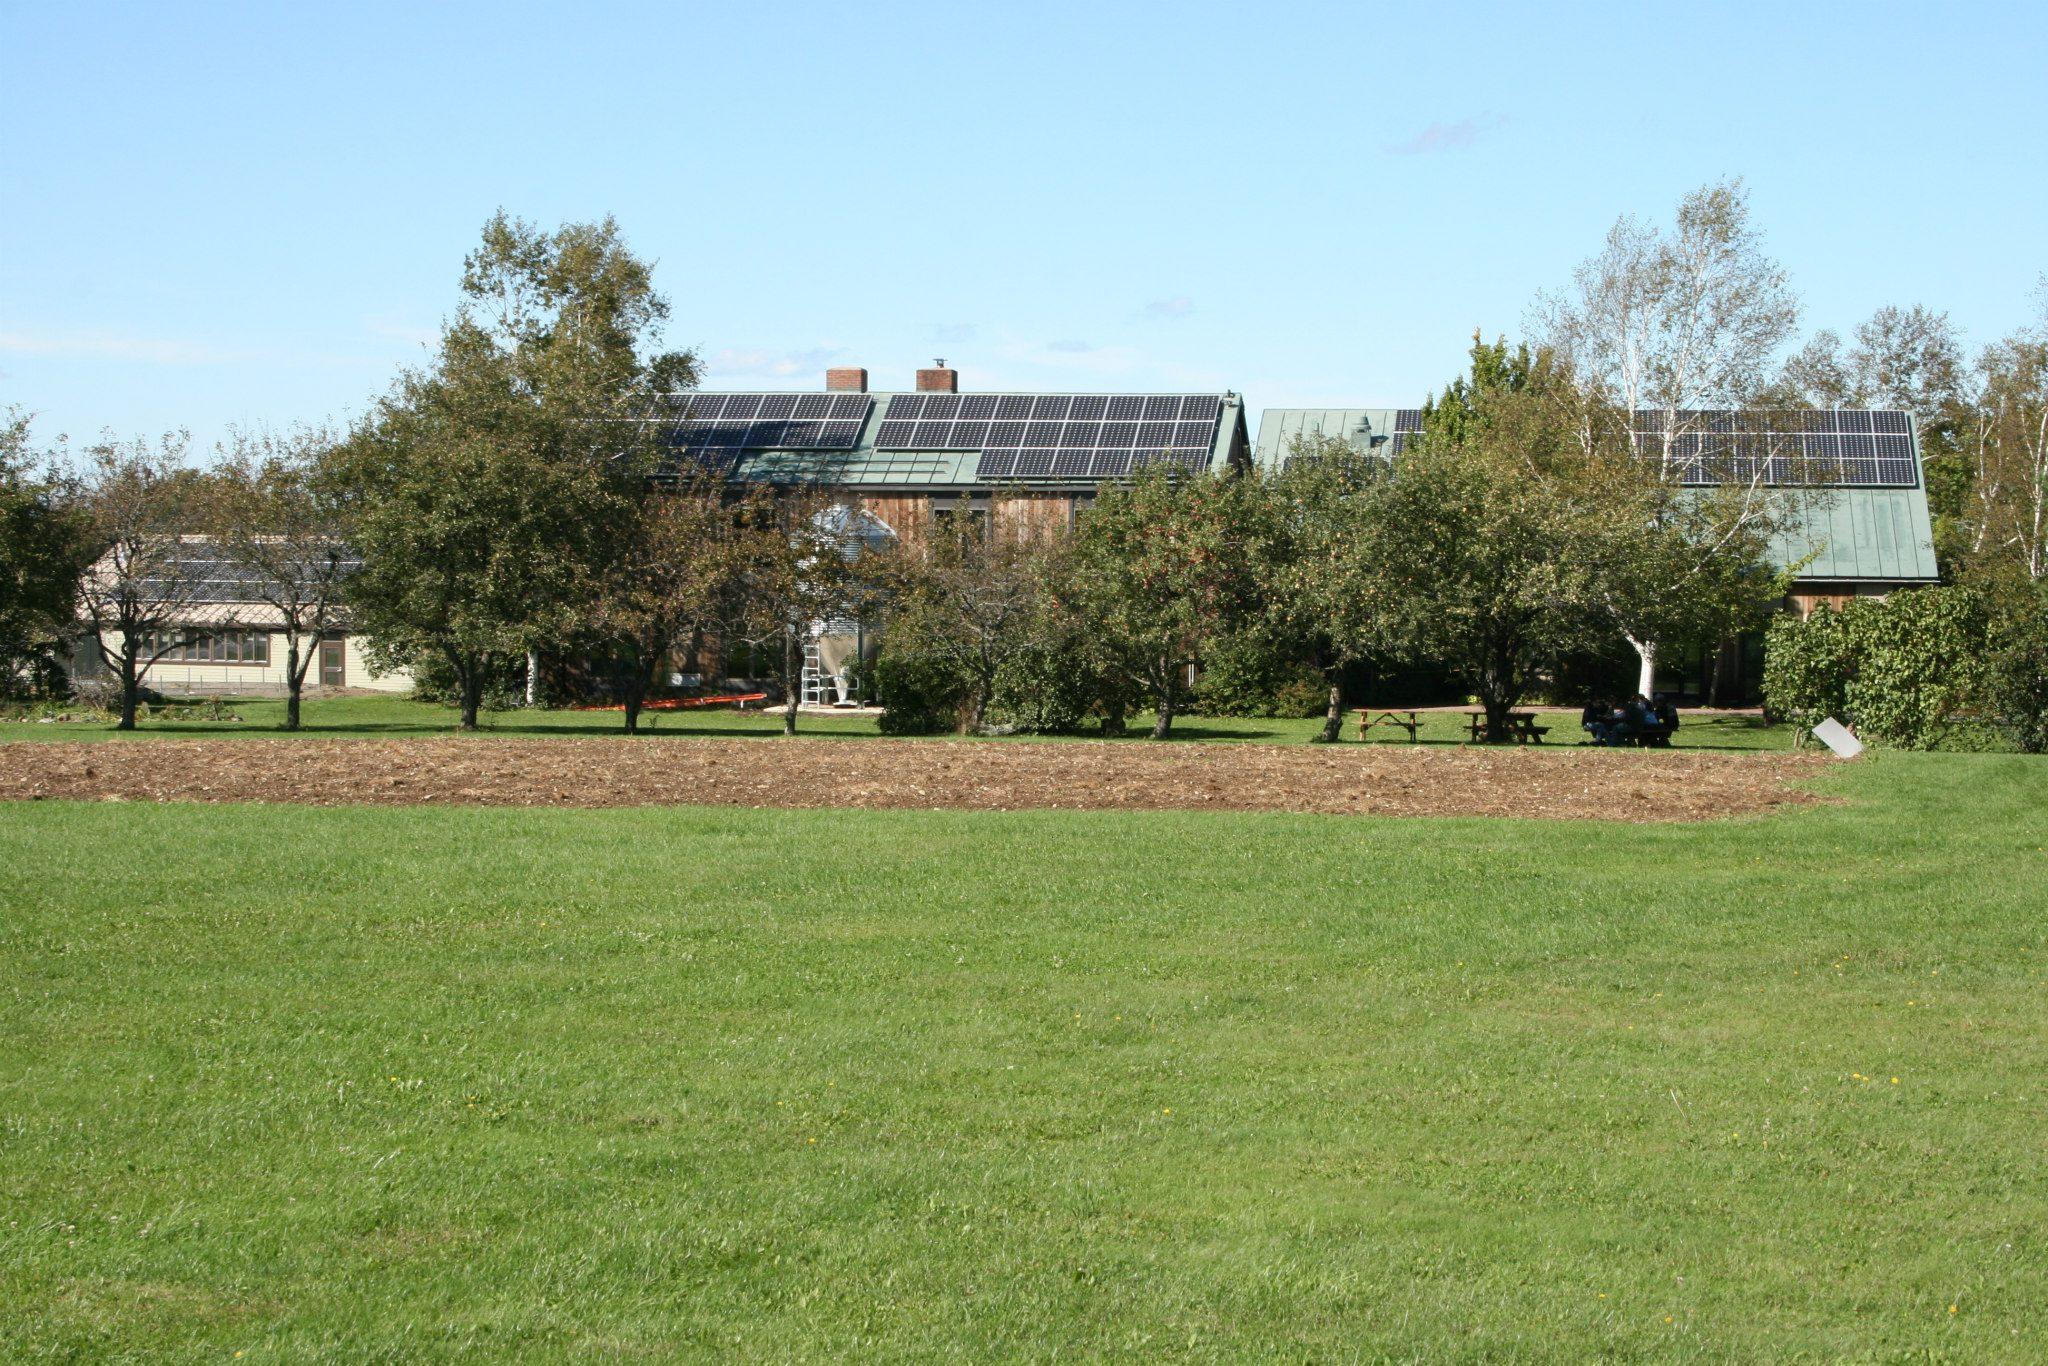 Unity College Library Solar Energysage